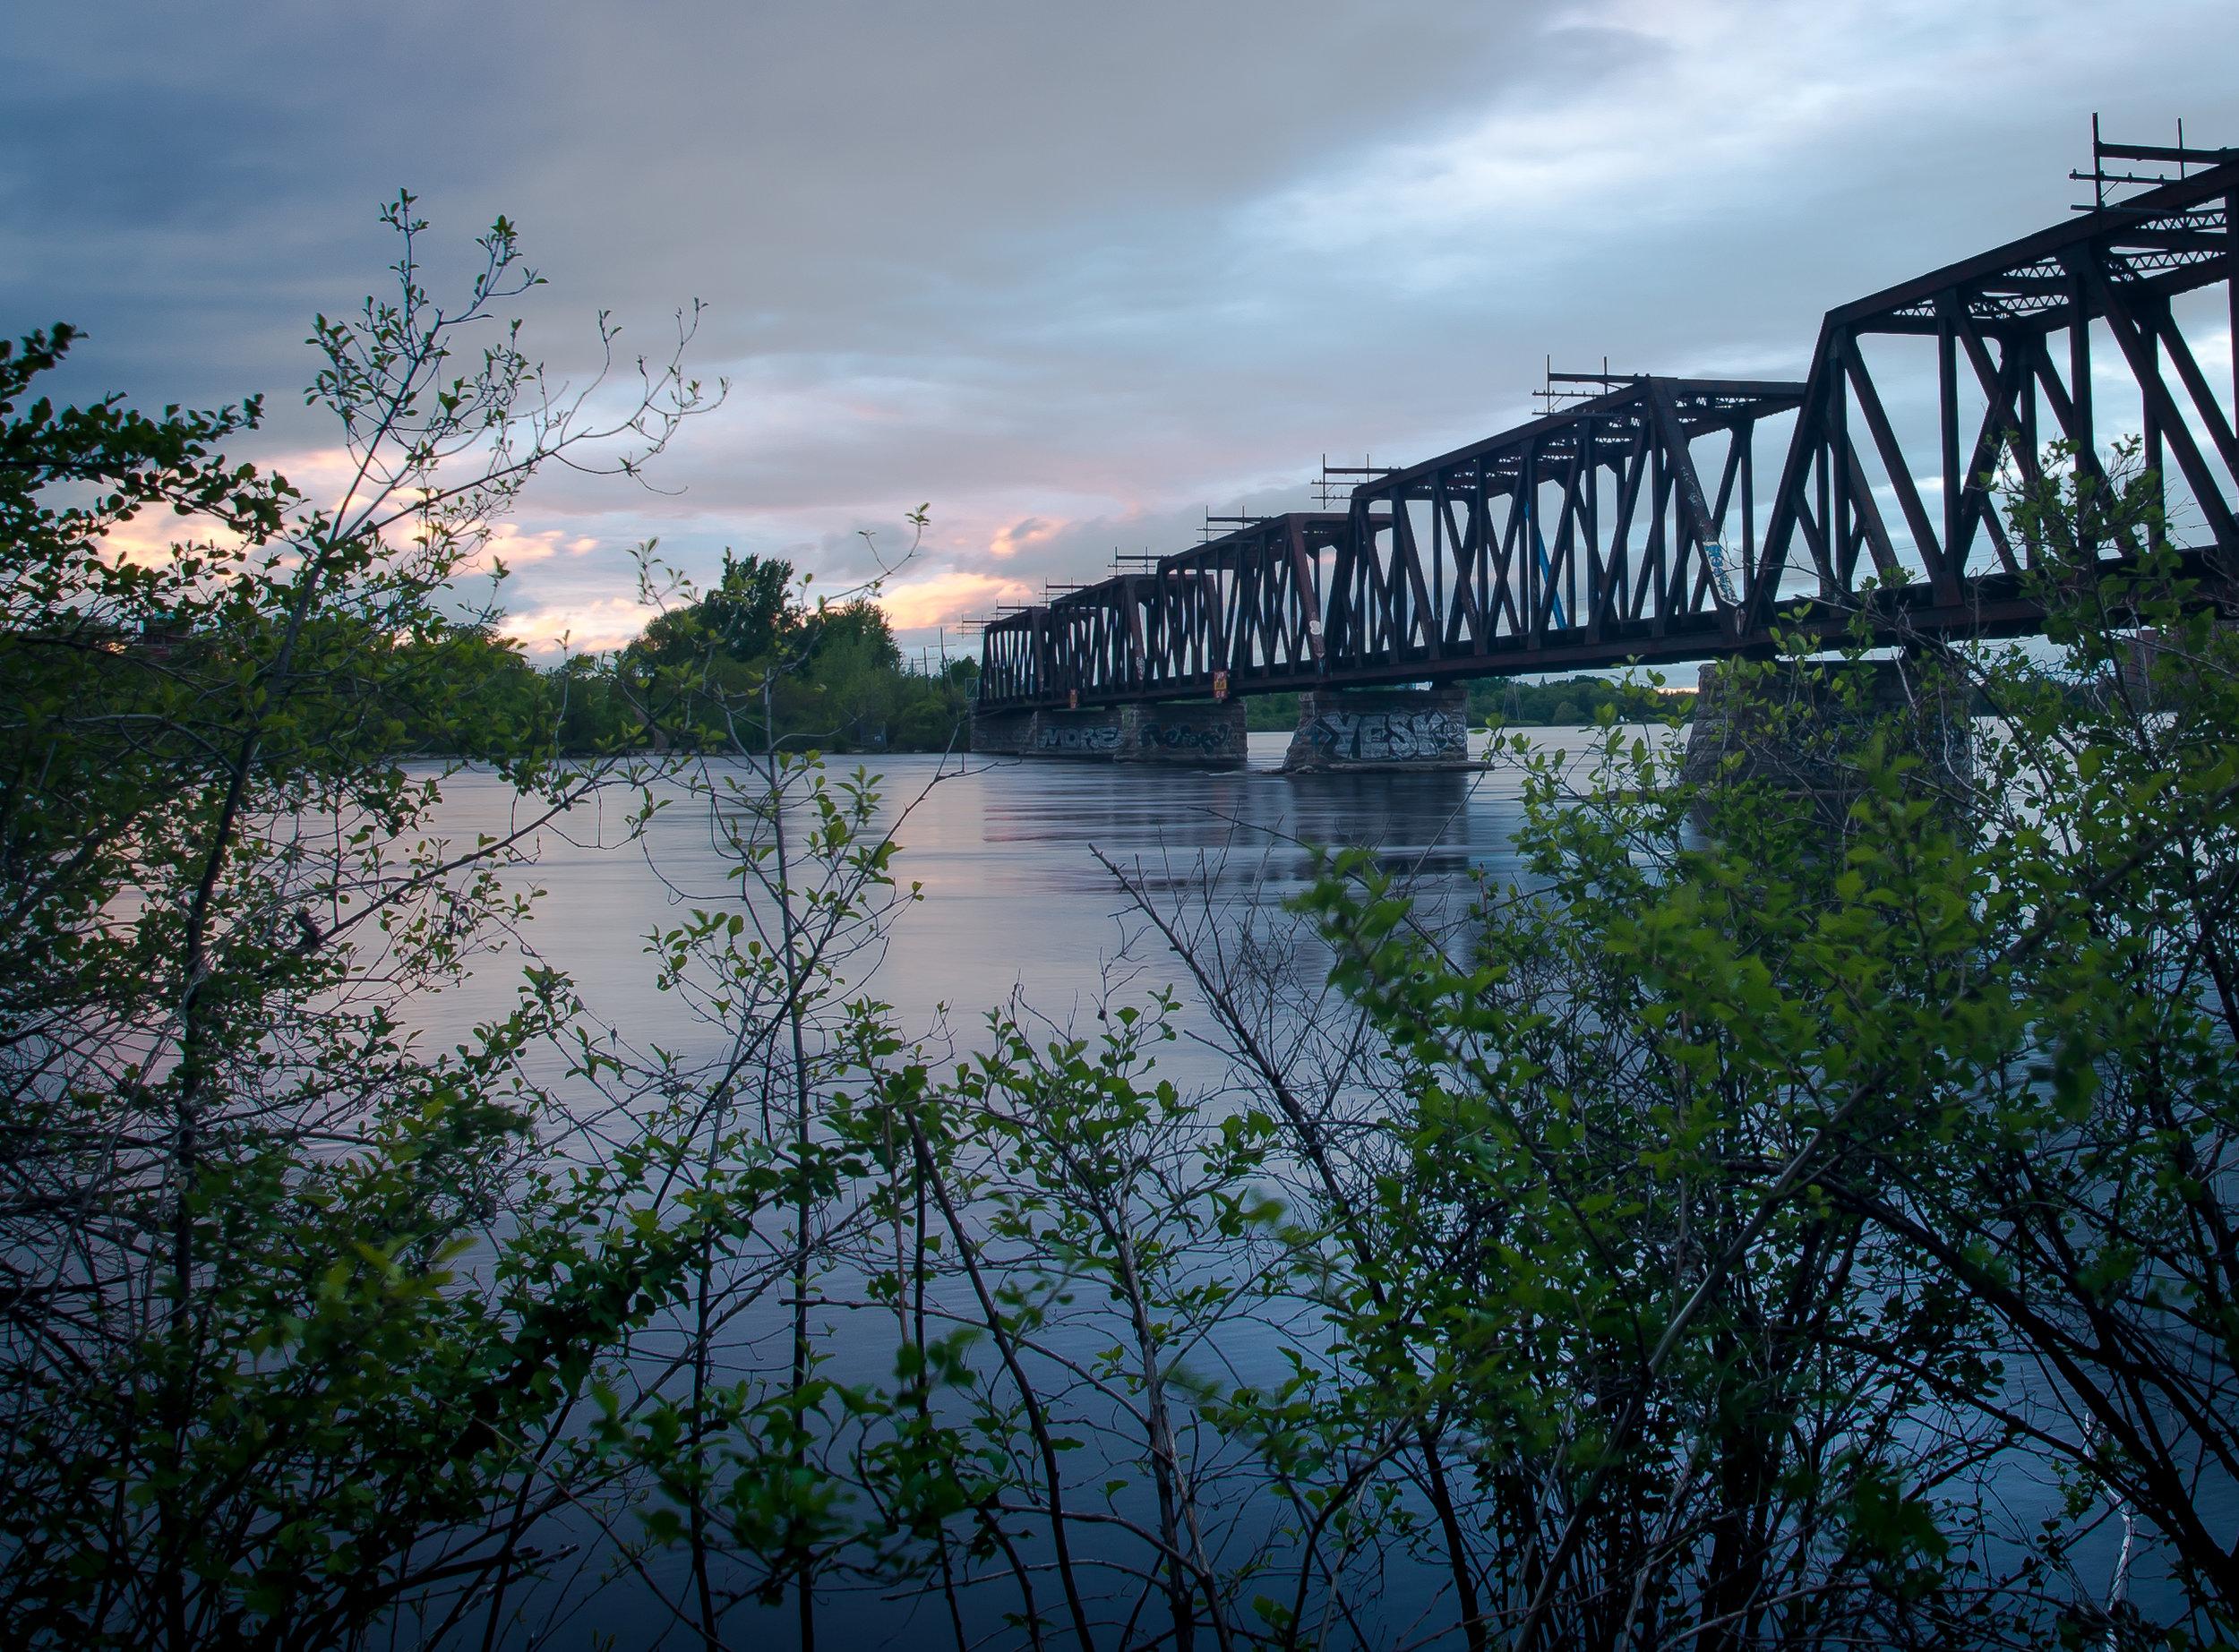 Ottawa Ventures - A project exploring the Ottawa area